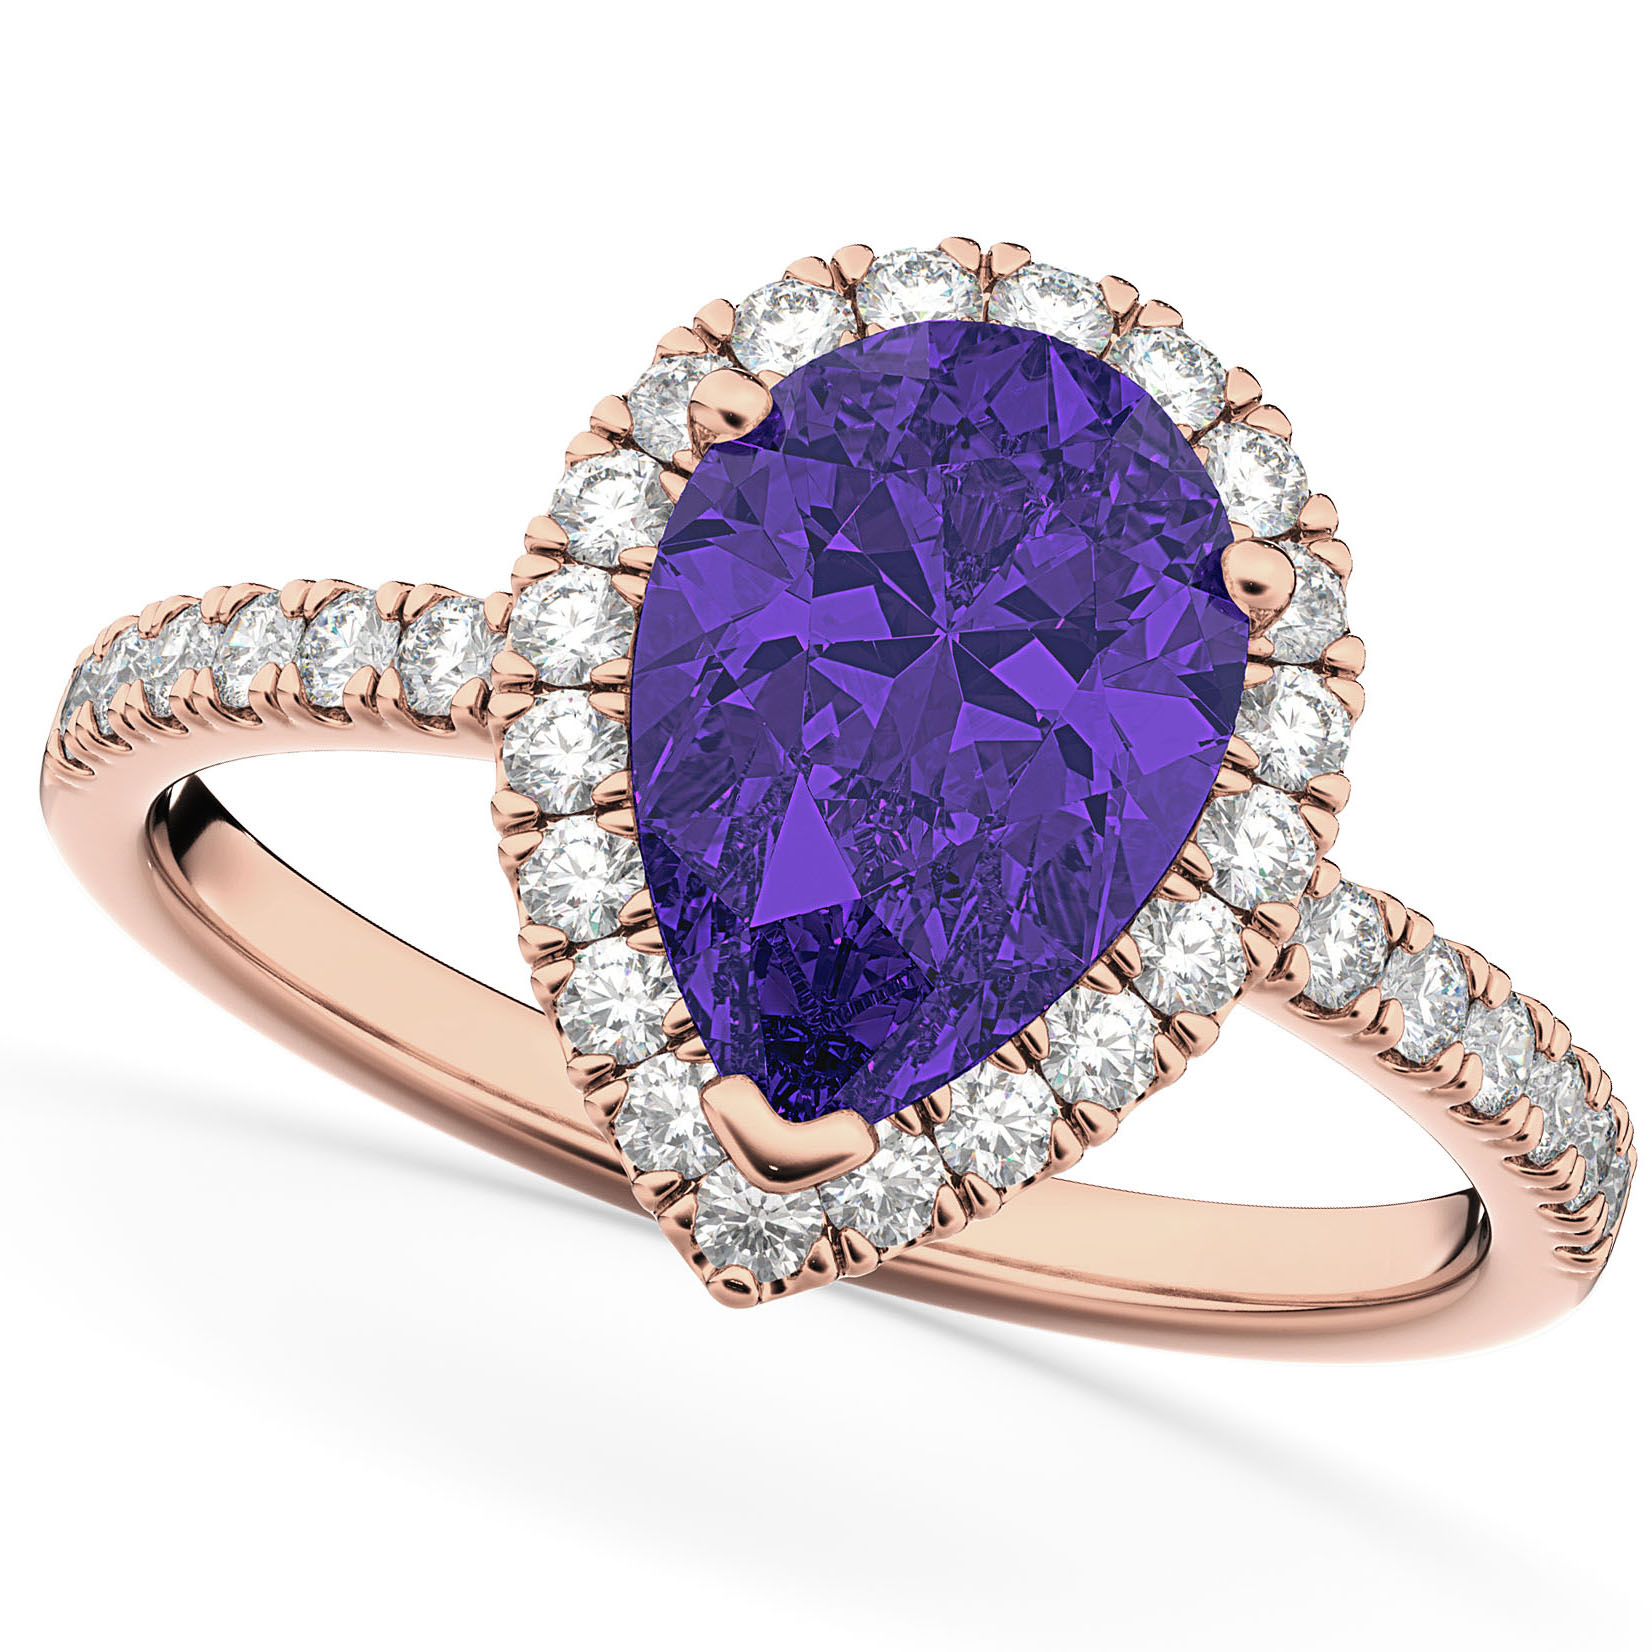 Pear Cut Halo Tanzanite & Diamond Engagement Ring 14K Rose Gold 1.54ct